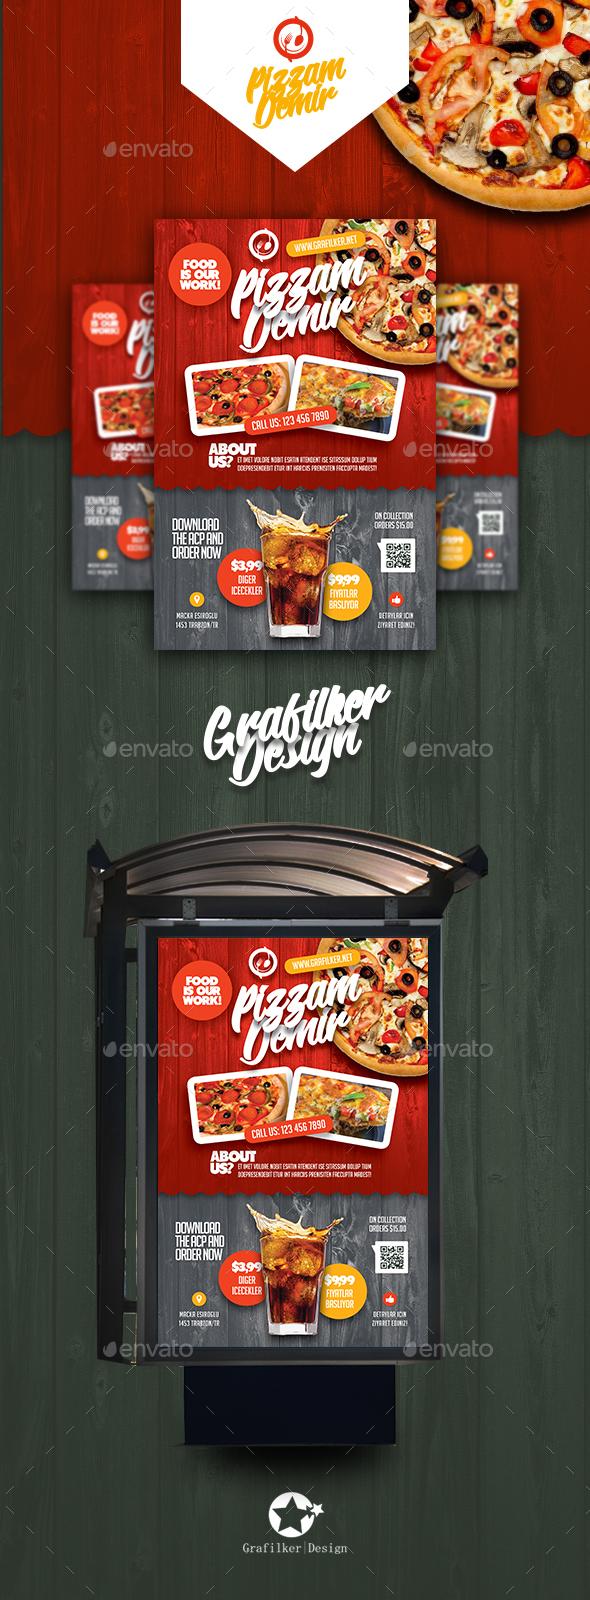 Restaurant Poster Templates - Signage Print Templates